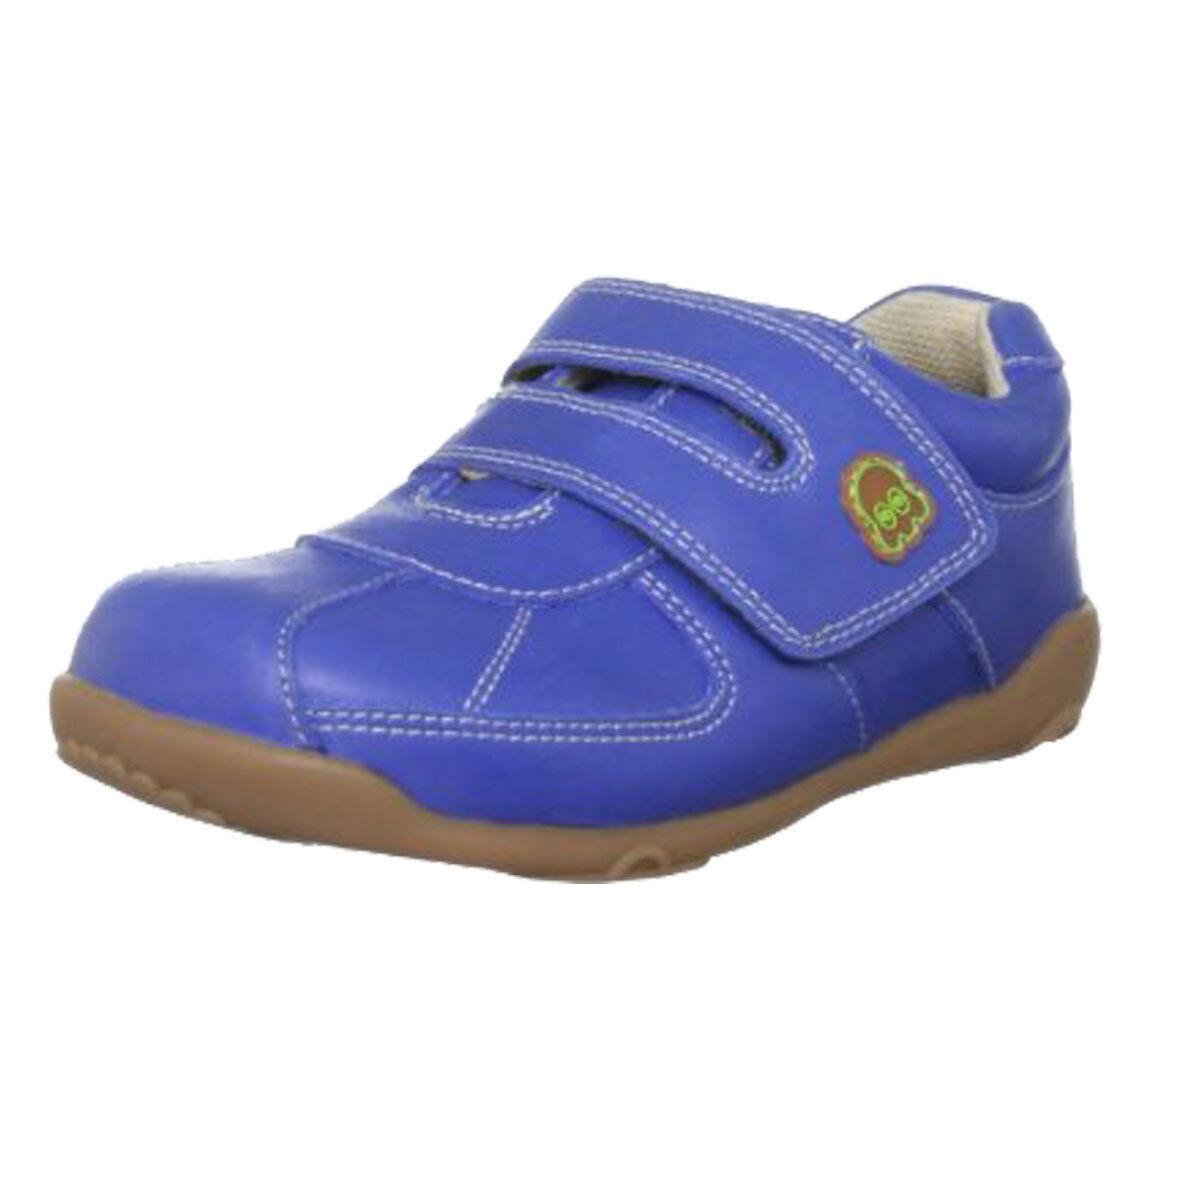 Boys Kids Pod Juniors Casual Infants Shoes Classic Trainers Blue Infants Casual Size 30b484